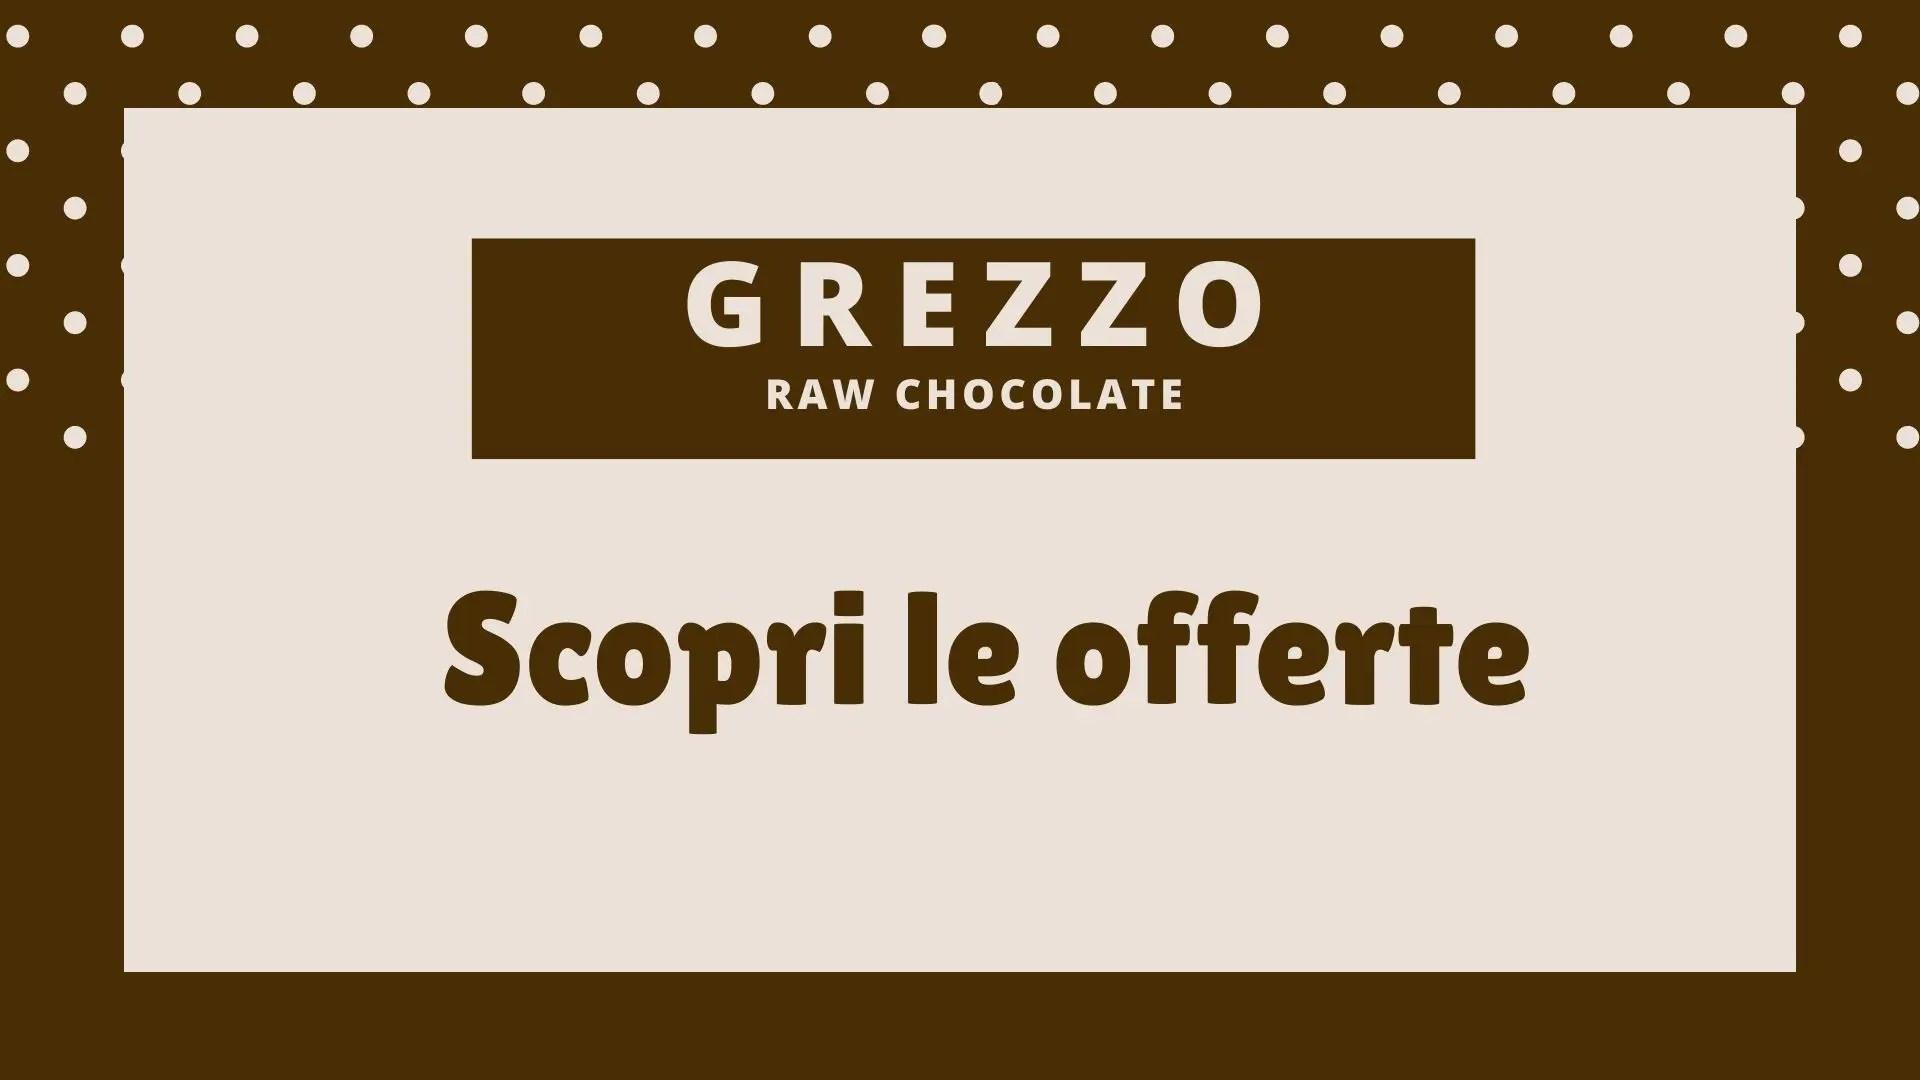 Grezzo Raw Chocolate - 2021-04-02T104023.558